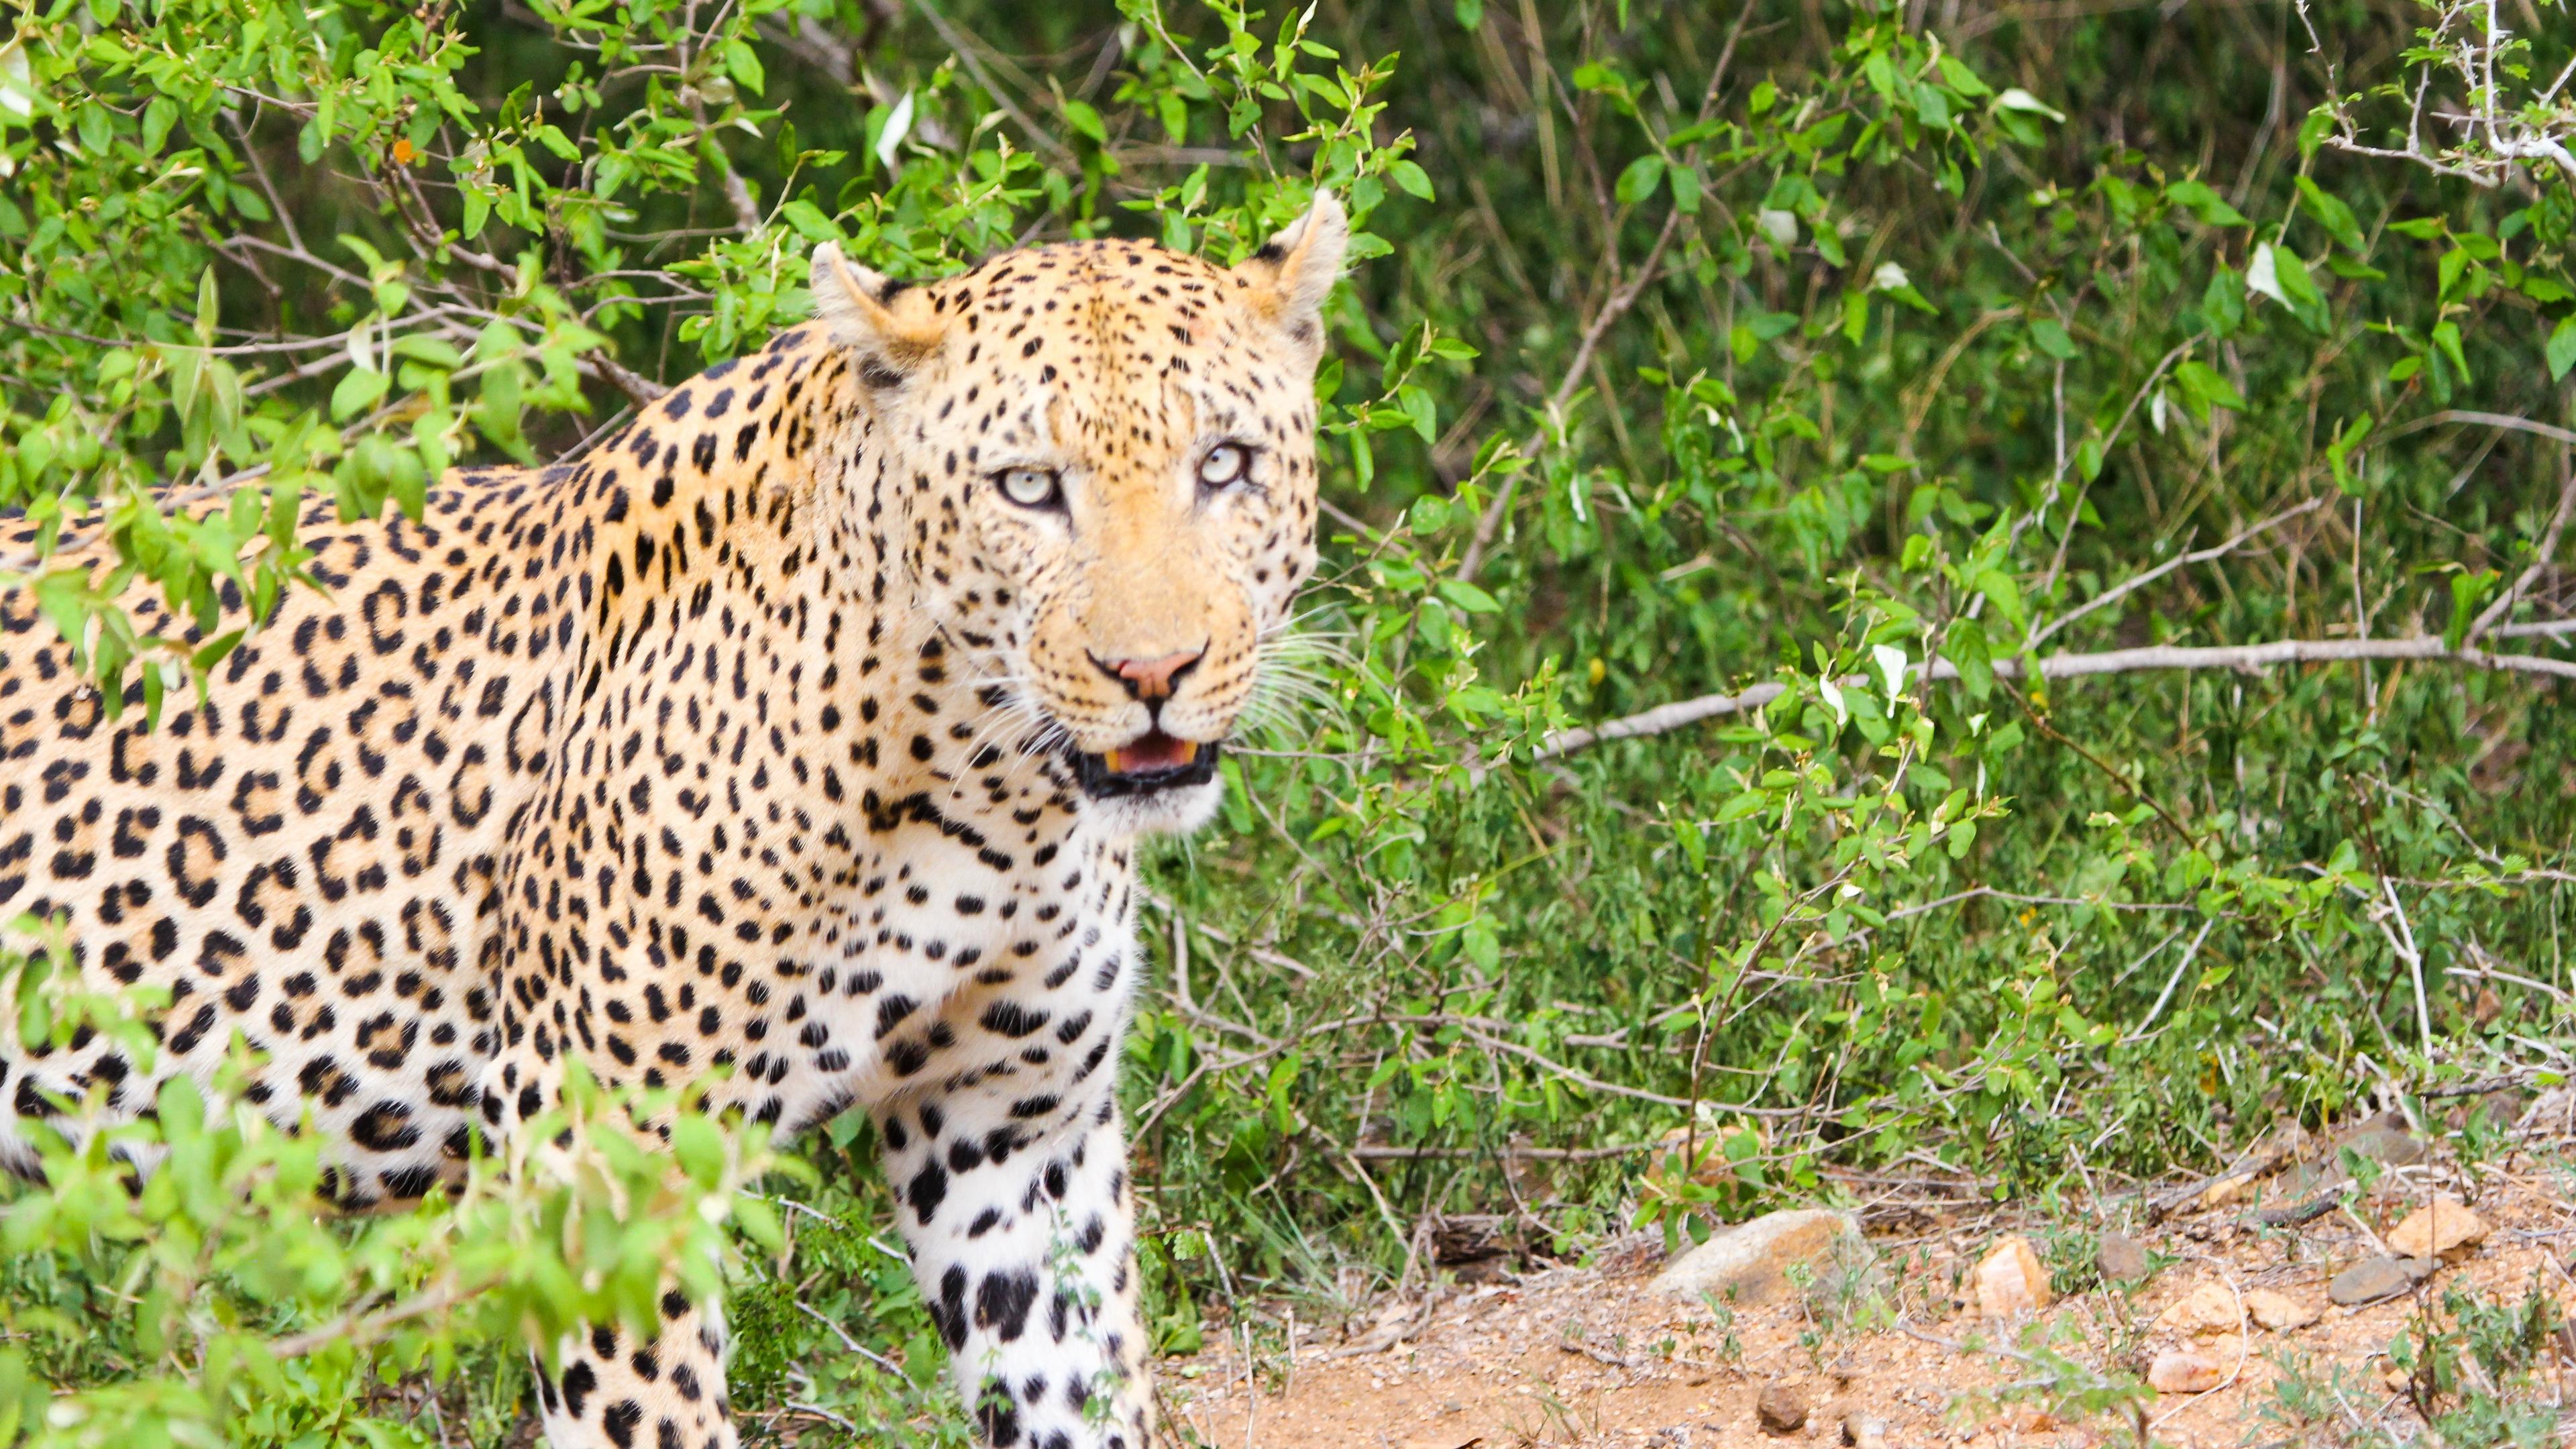 leopard cheetah predator look 4k 1542241586 - leopard, cheetah, predator, look 4k - Predator, Leopard, Cheetah